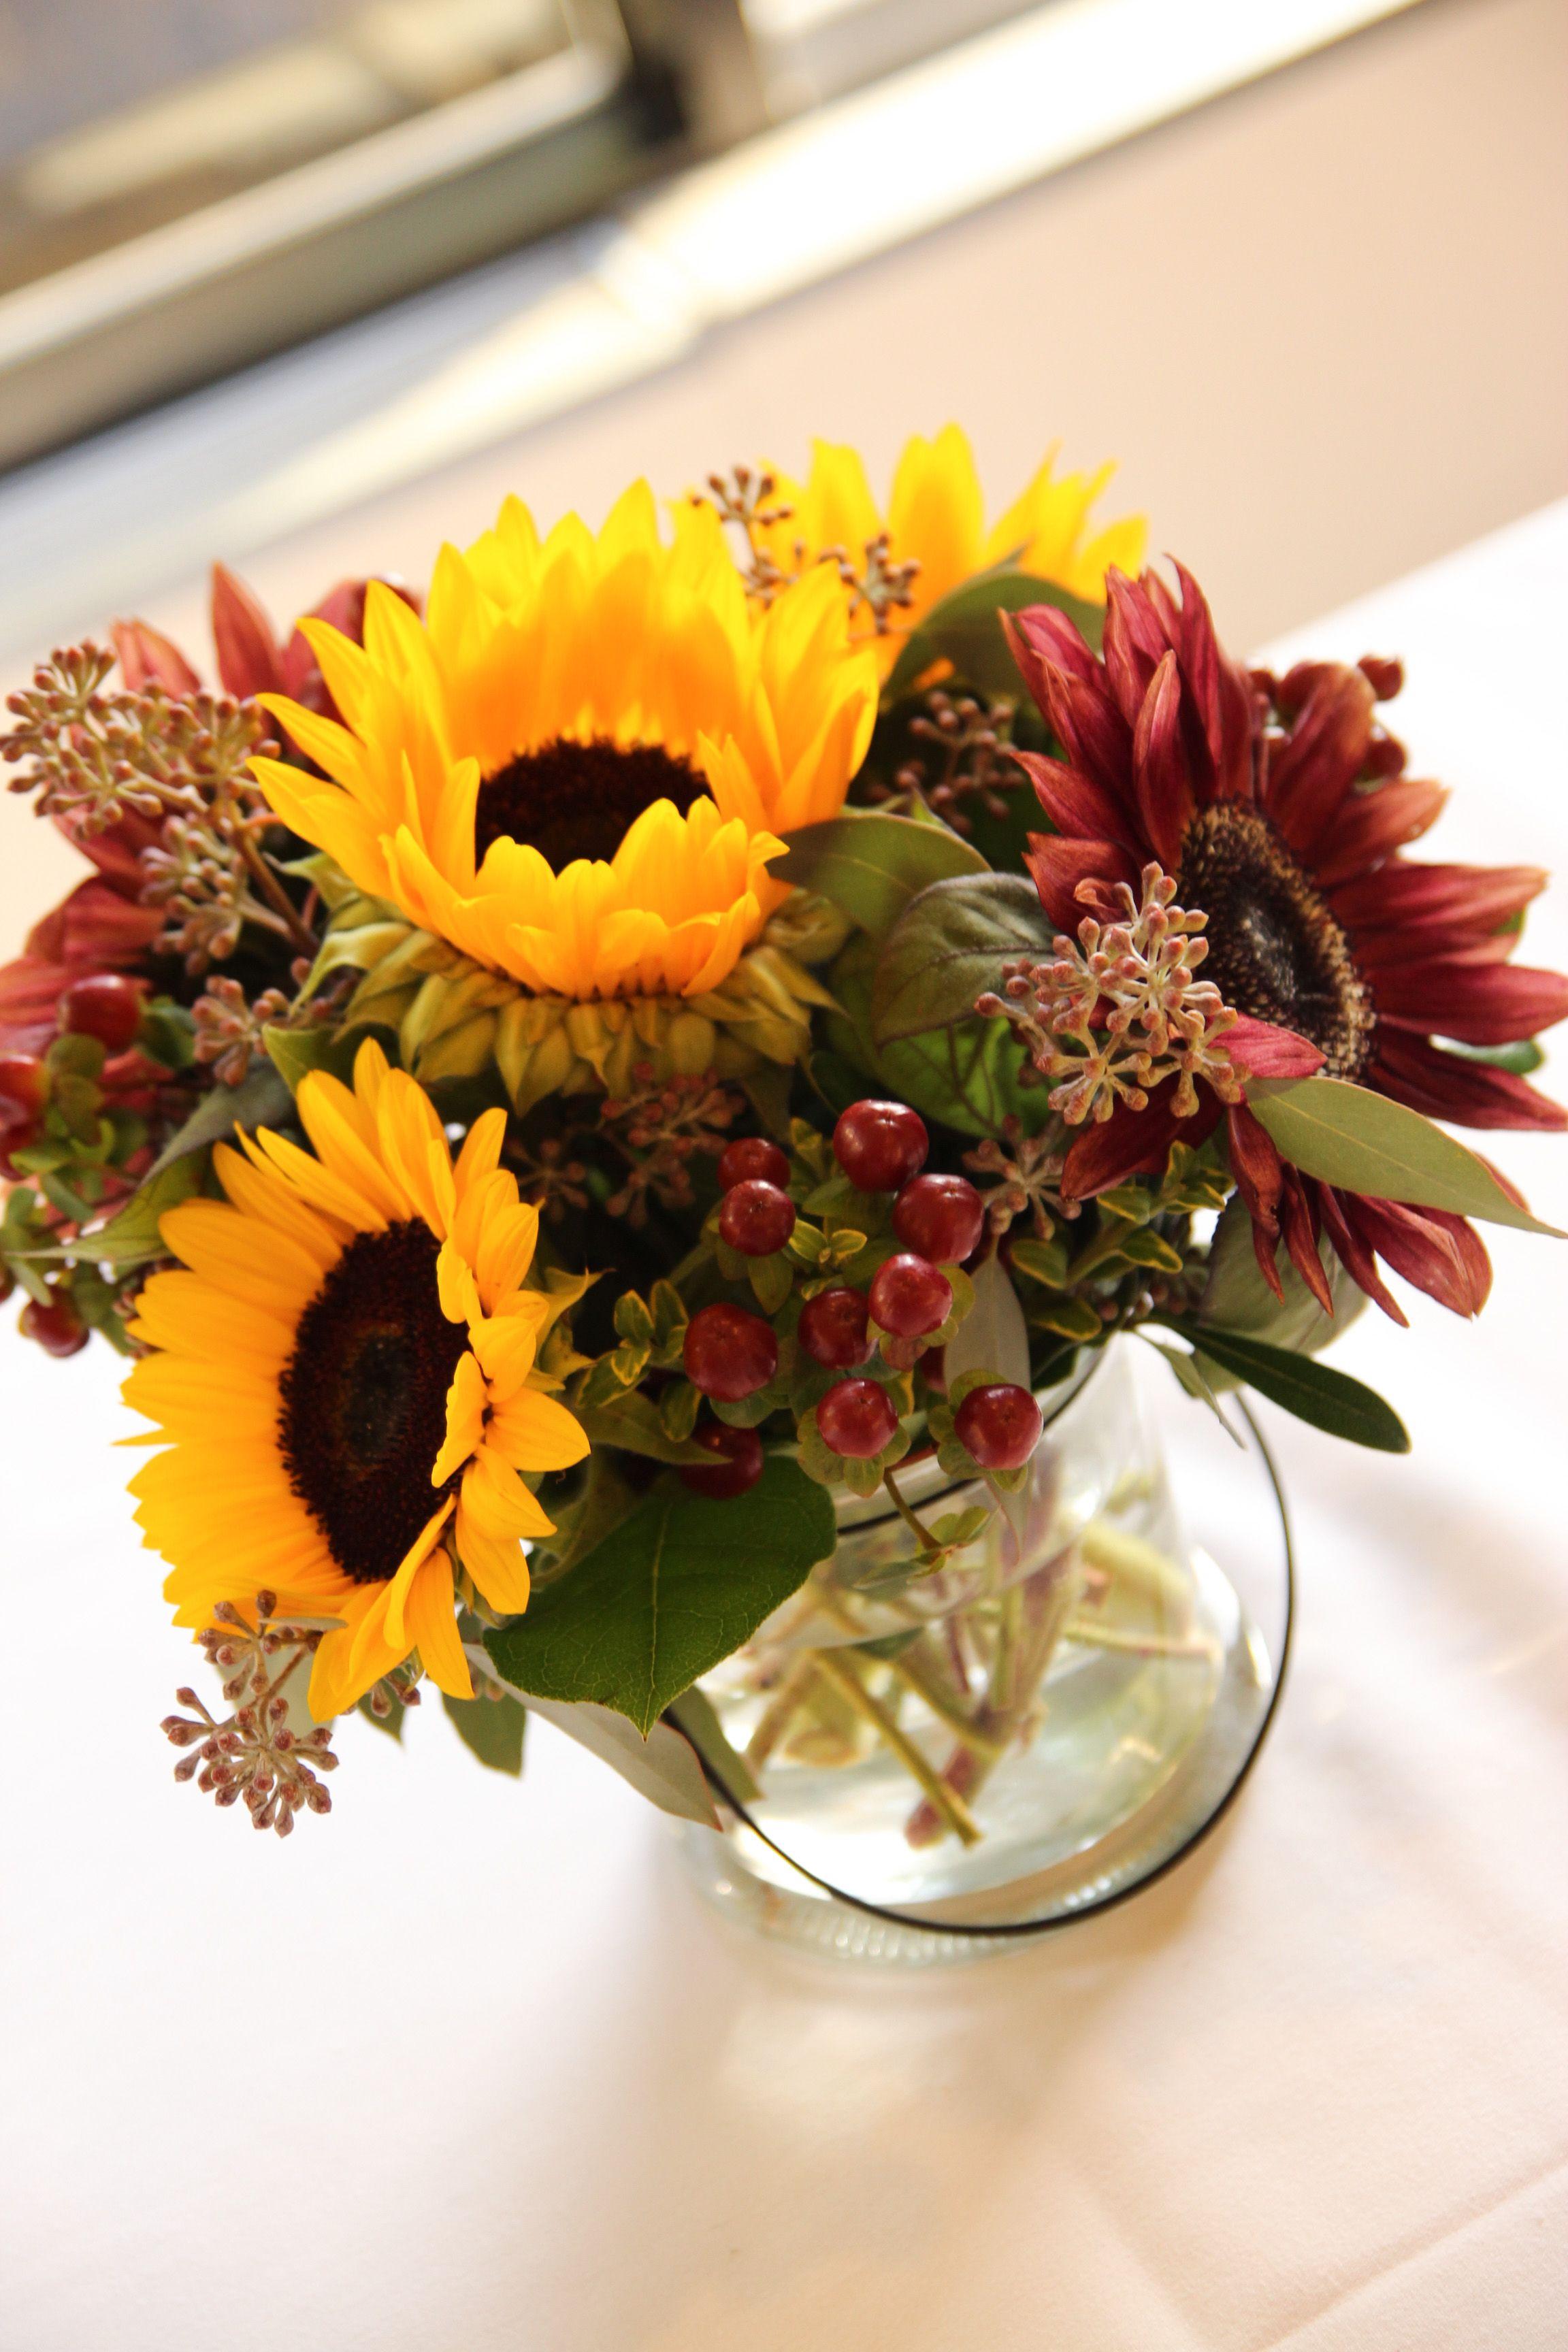 Fall wedding flowers. Brown sunflowers, sunflower